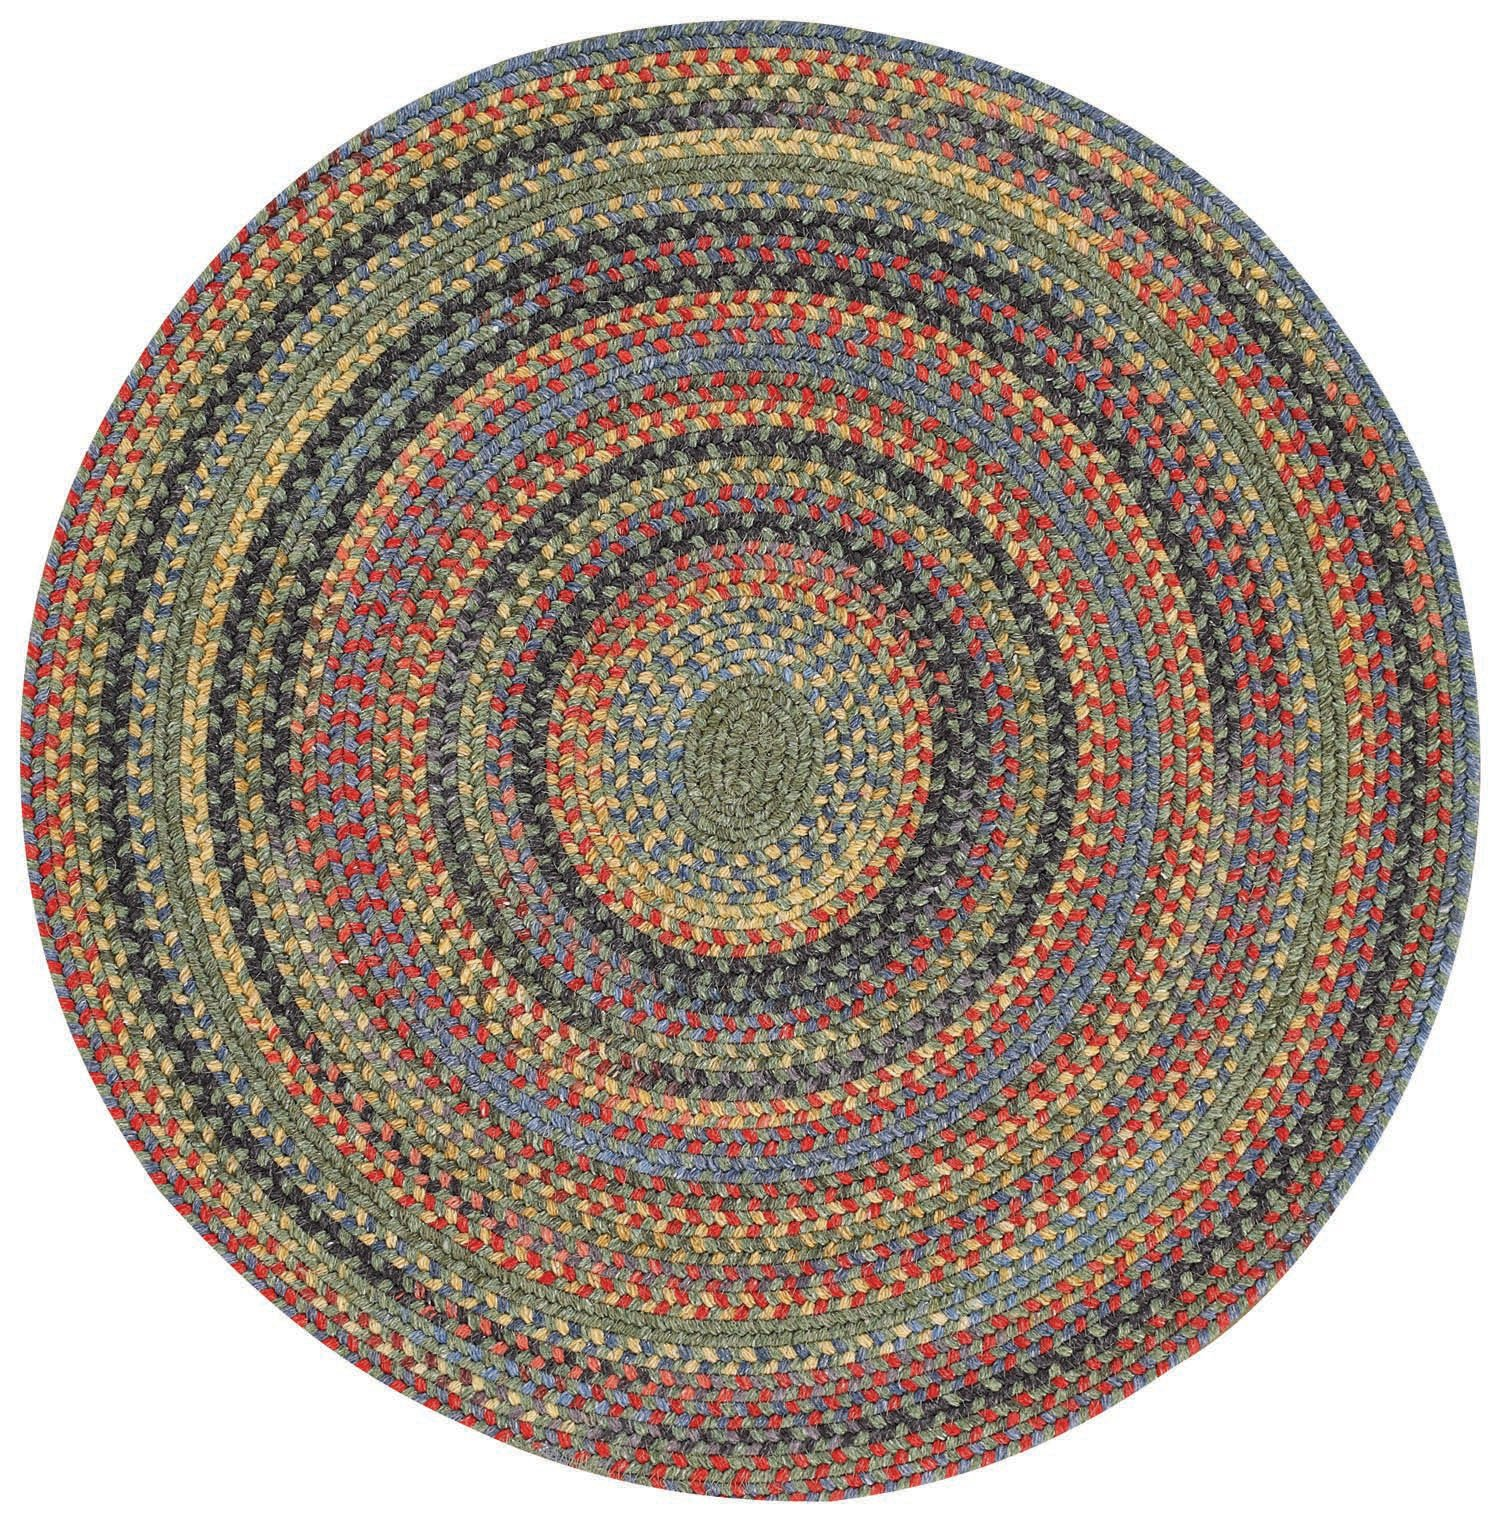 Round Braided Rug: Amazon.com